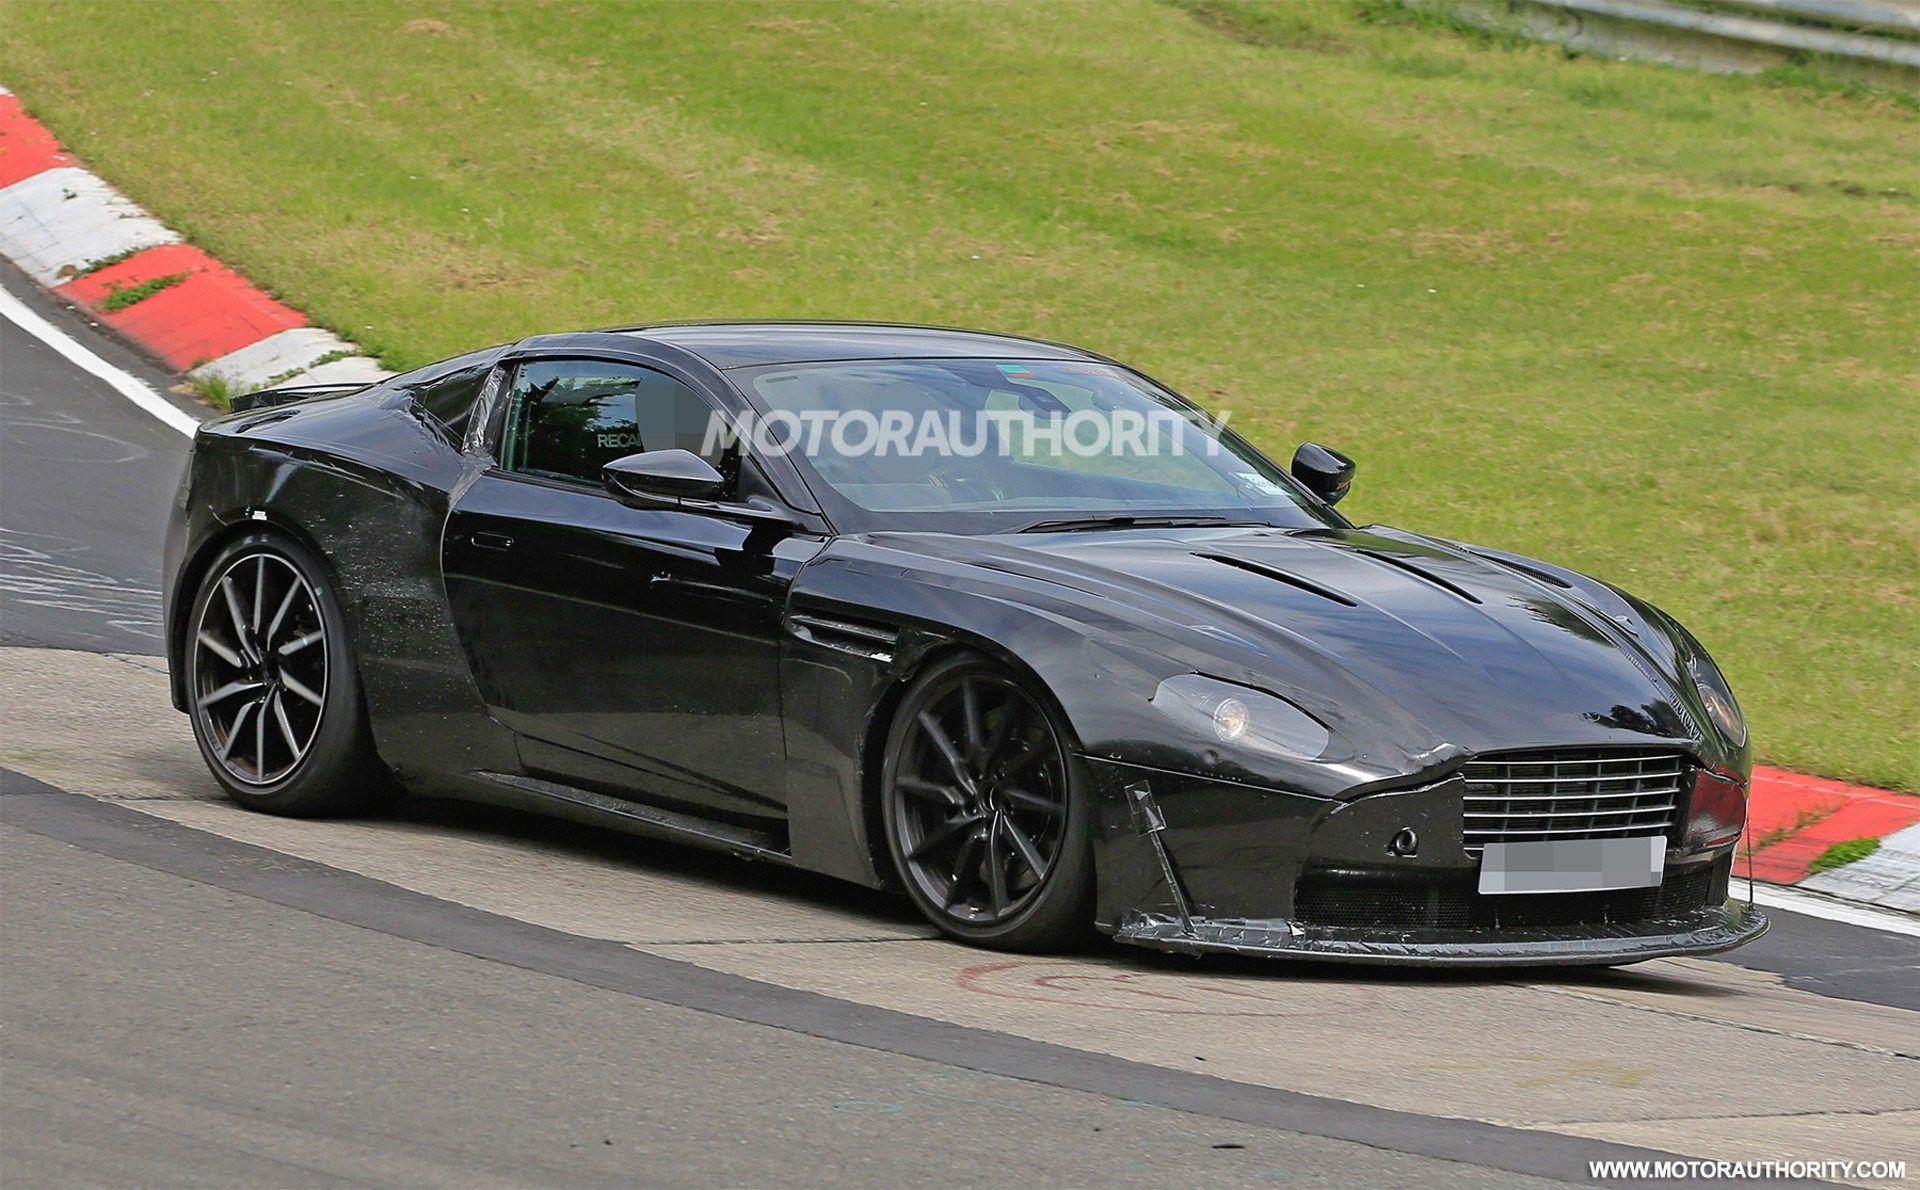 Aston Martin Vantage GT Review Price Horsepower - Aston martin vantage gt 2018